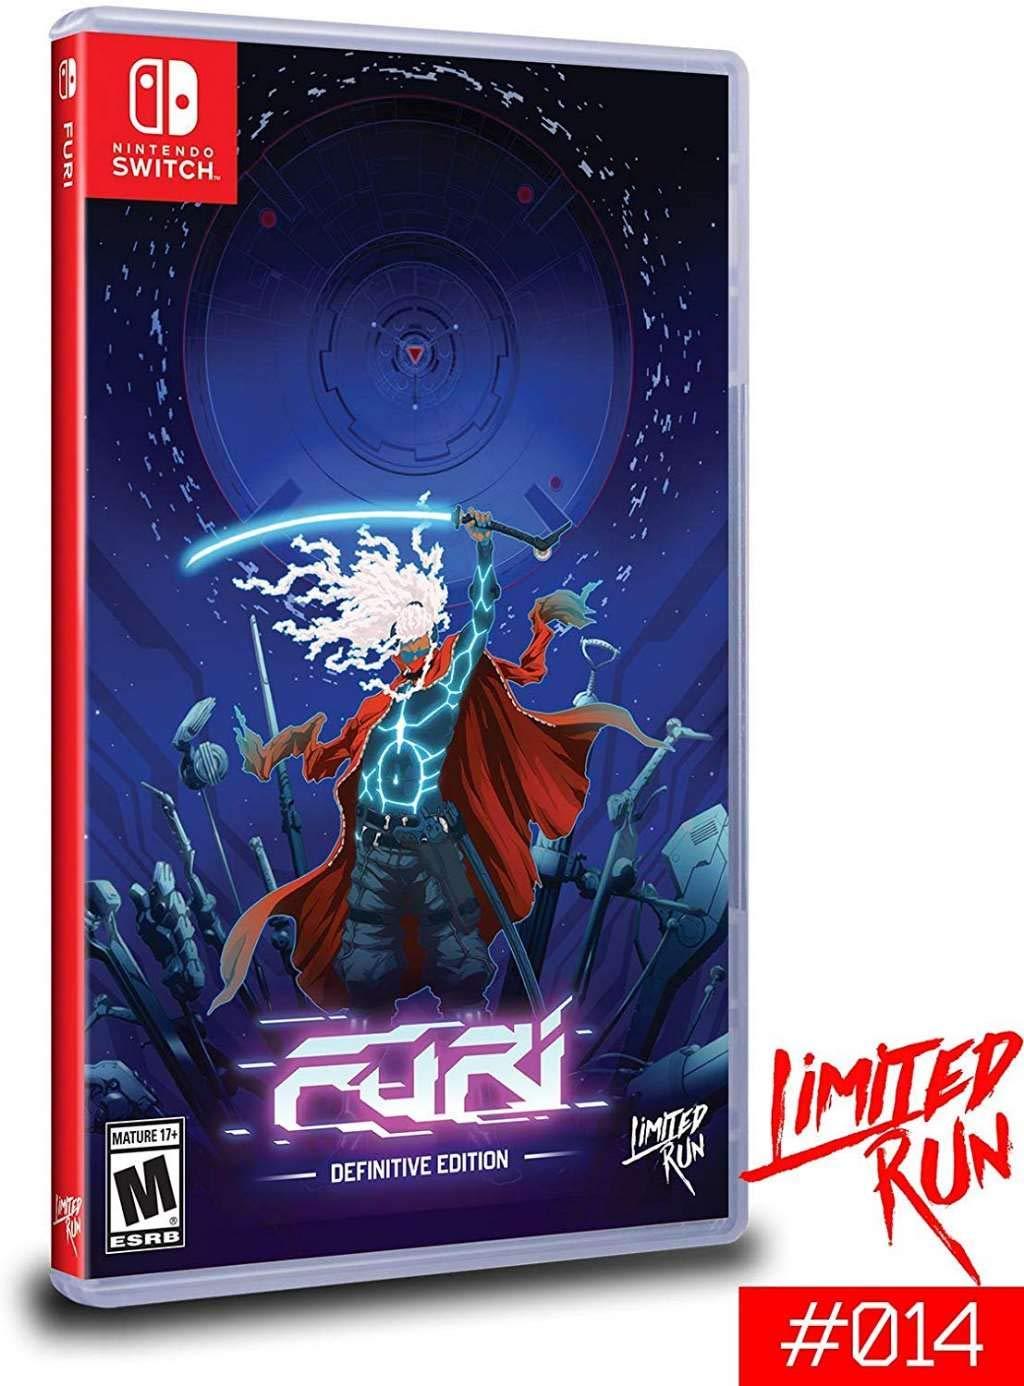 Amazon.com: Furi Definitive Edition (Switch Limited Run #14 ...